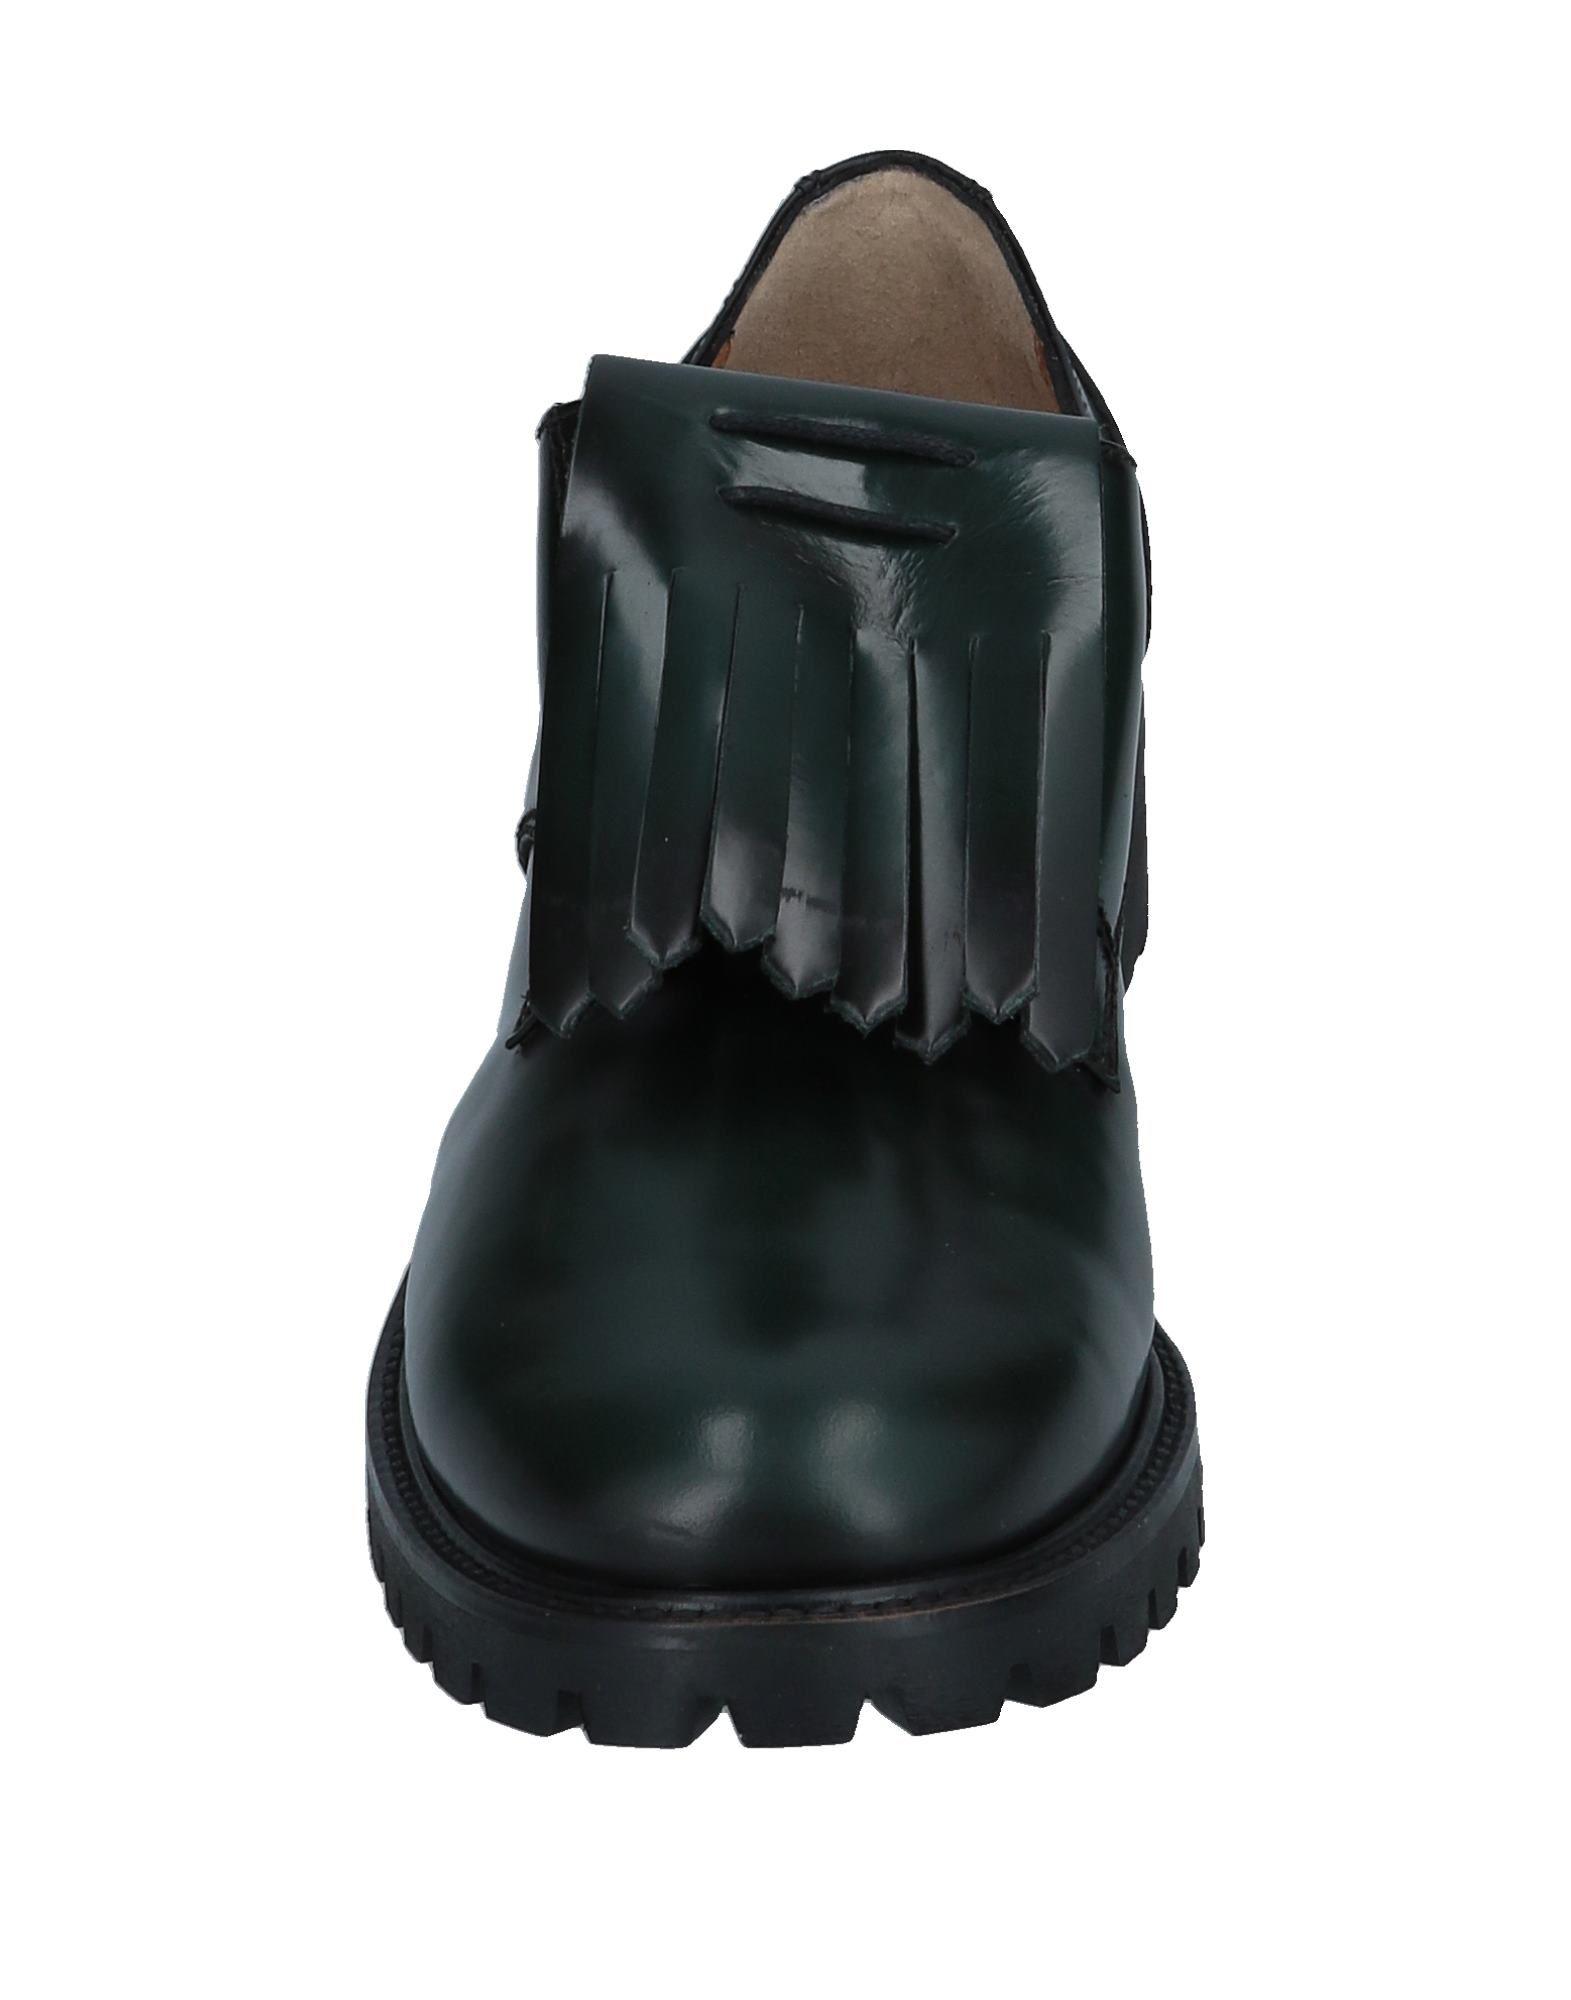 Stilvolle Schnürschuhe billige Schuhe Liviana Conti Schnürschuhe Stilvolle Damen  11008475TE 436049